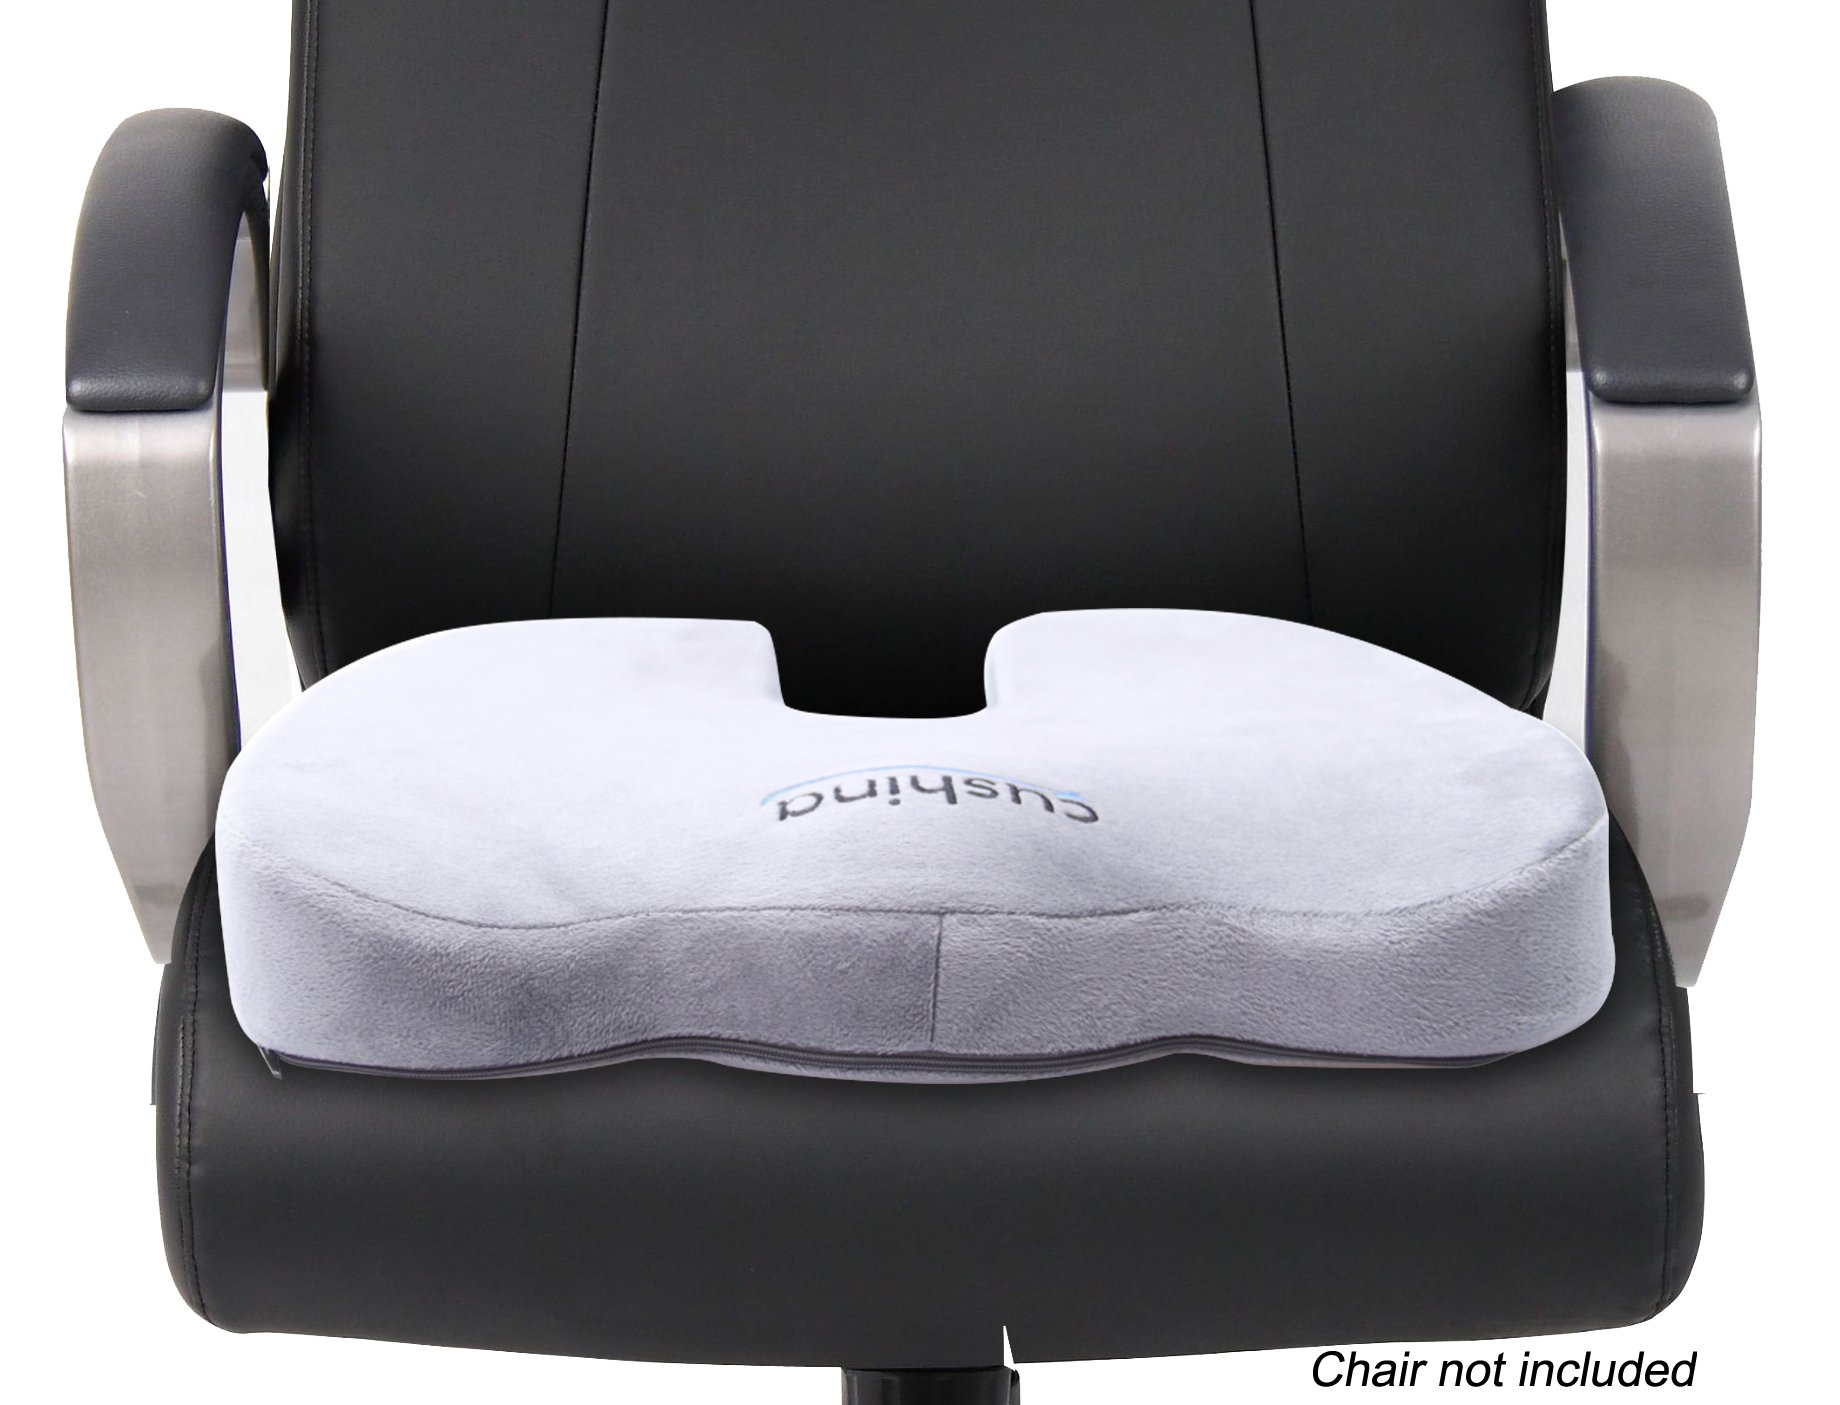 Cushina Memory Foam Seat Cushion Premium Orthopedic